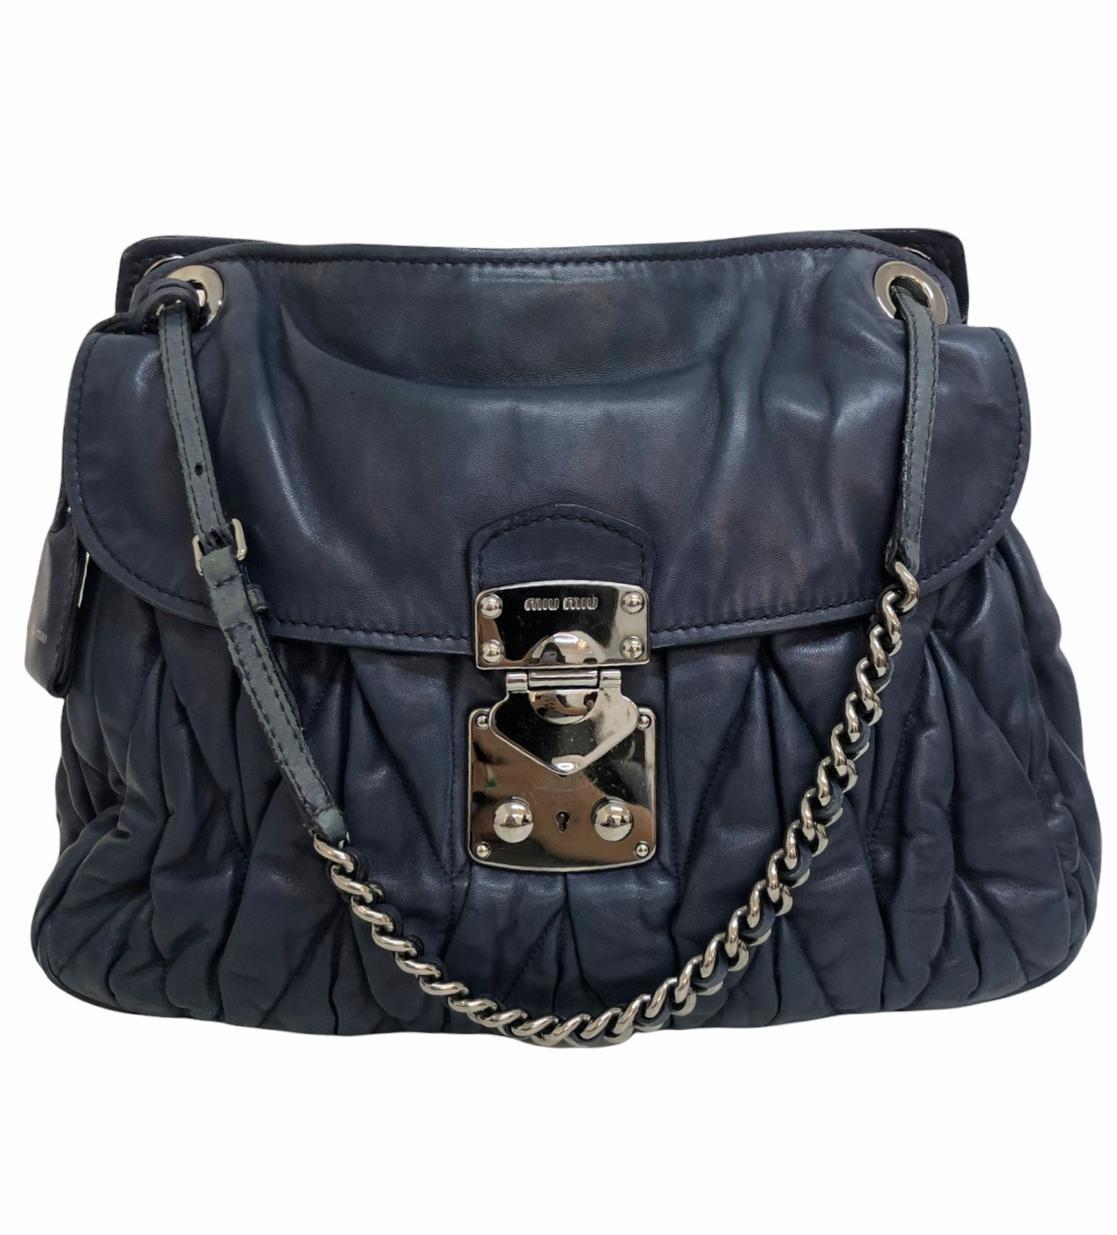 Bolsa Miu Miu Coffer Matelassé Azul